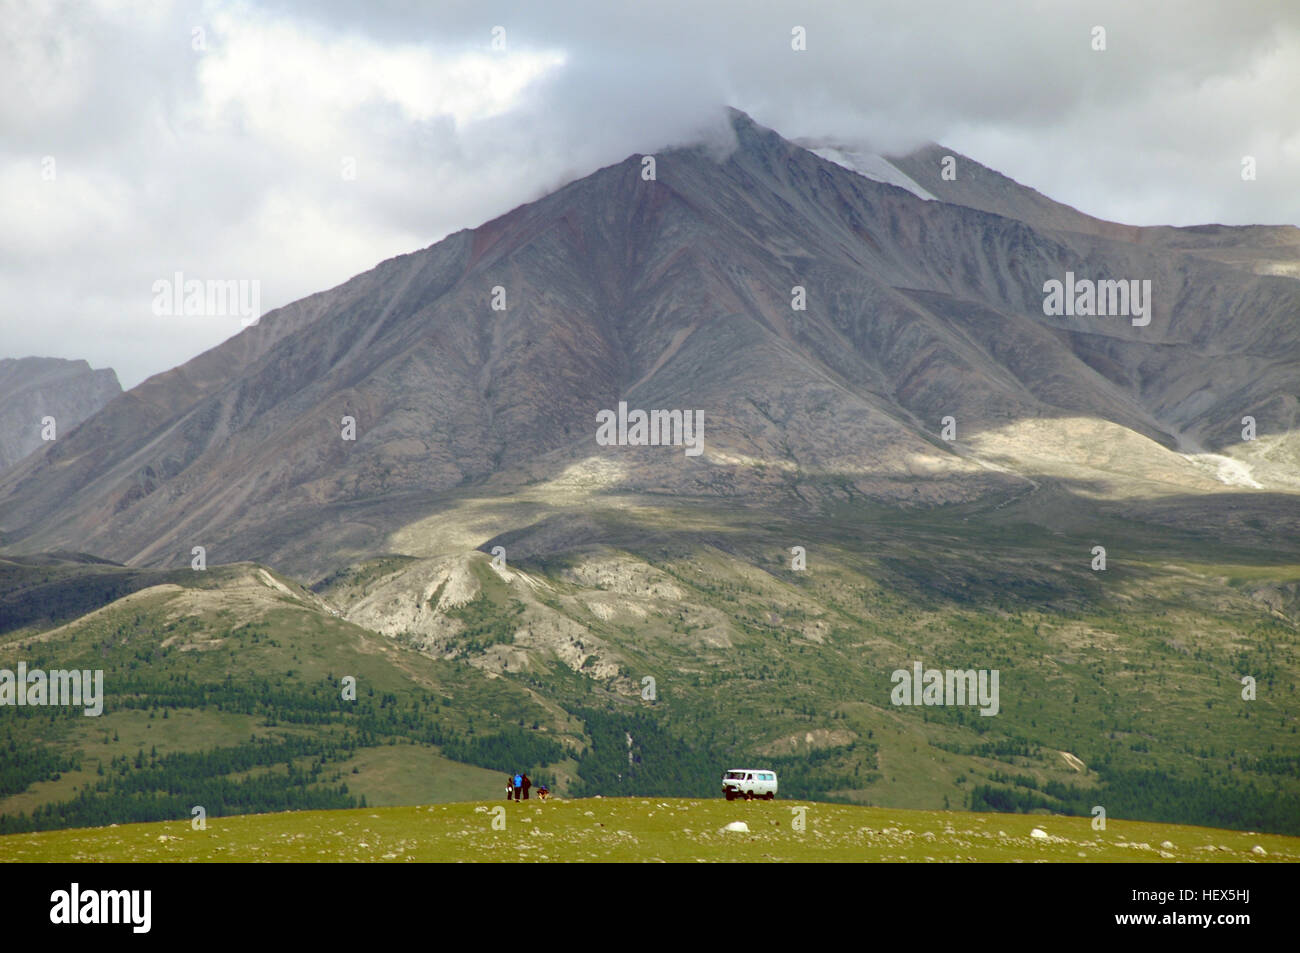 Sayan Mountains, Hovsgol, Mongolia Stock Photo